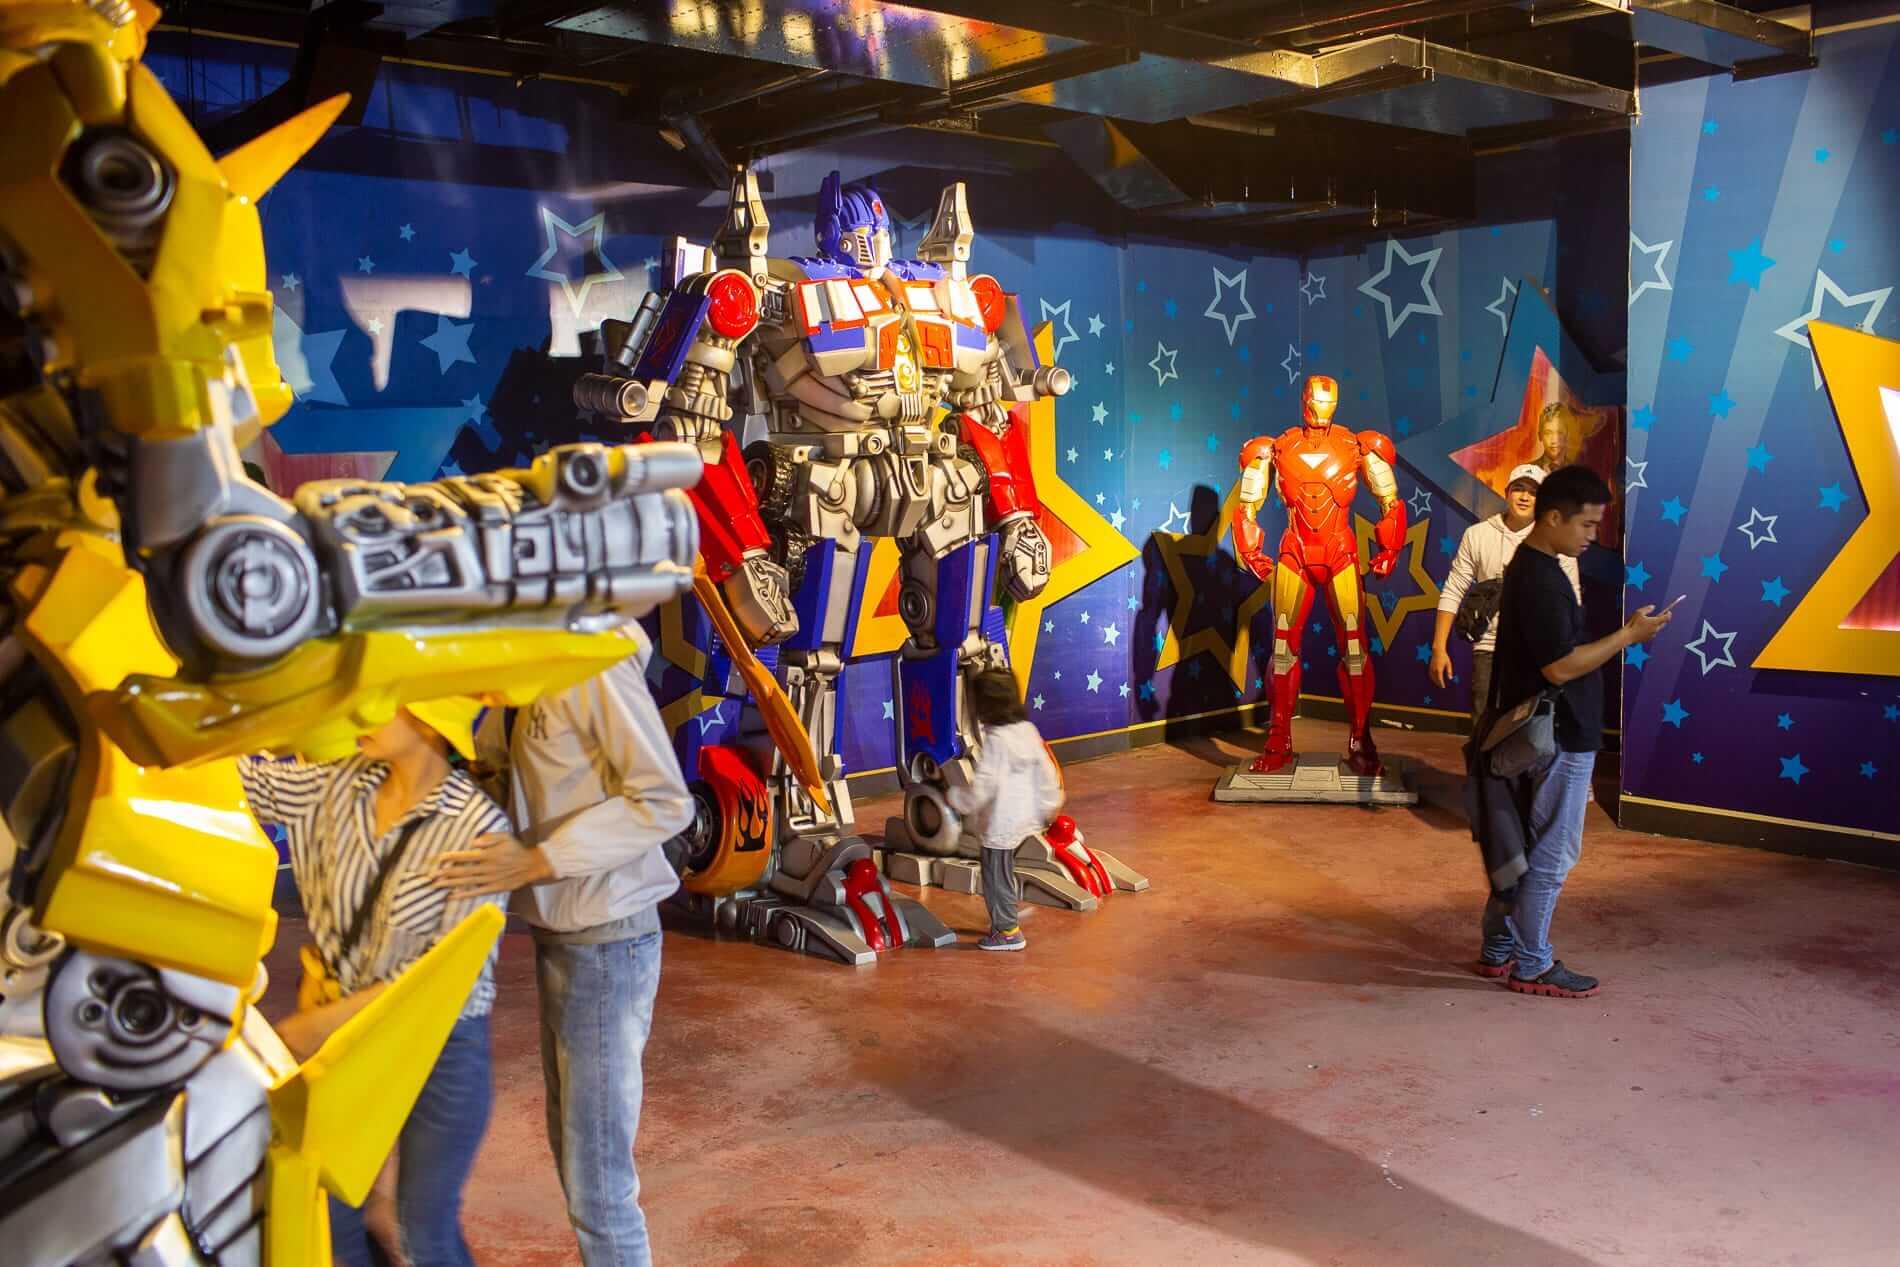 Wax museum transformers